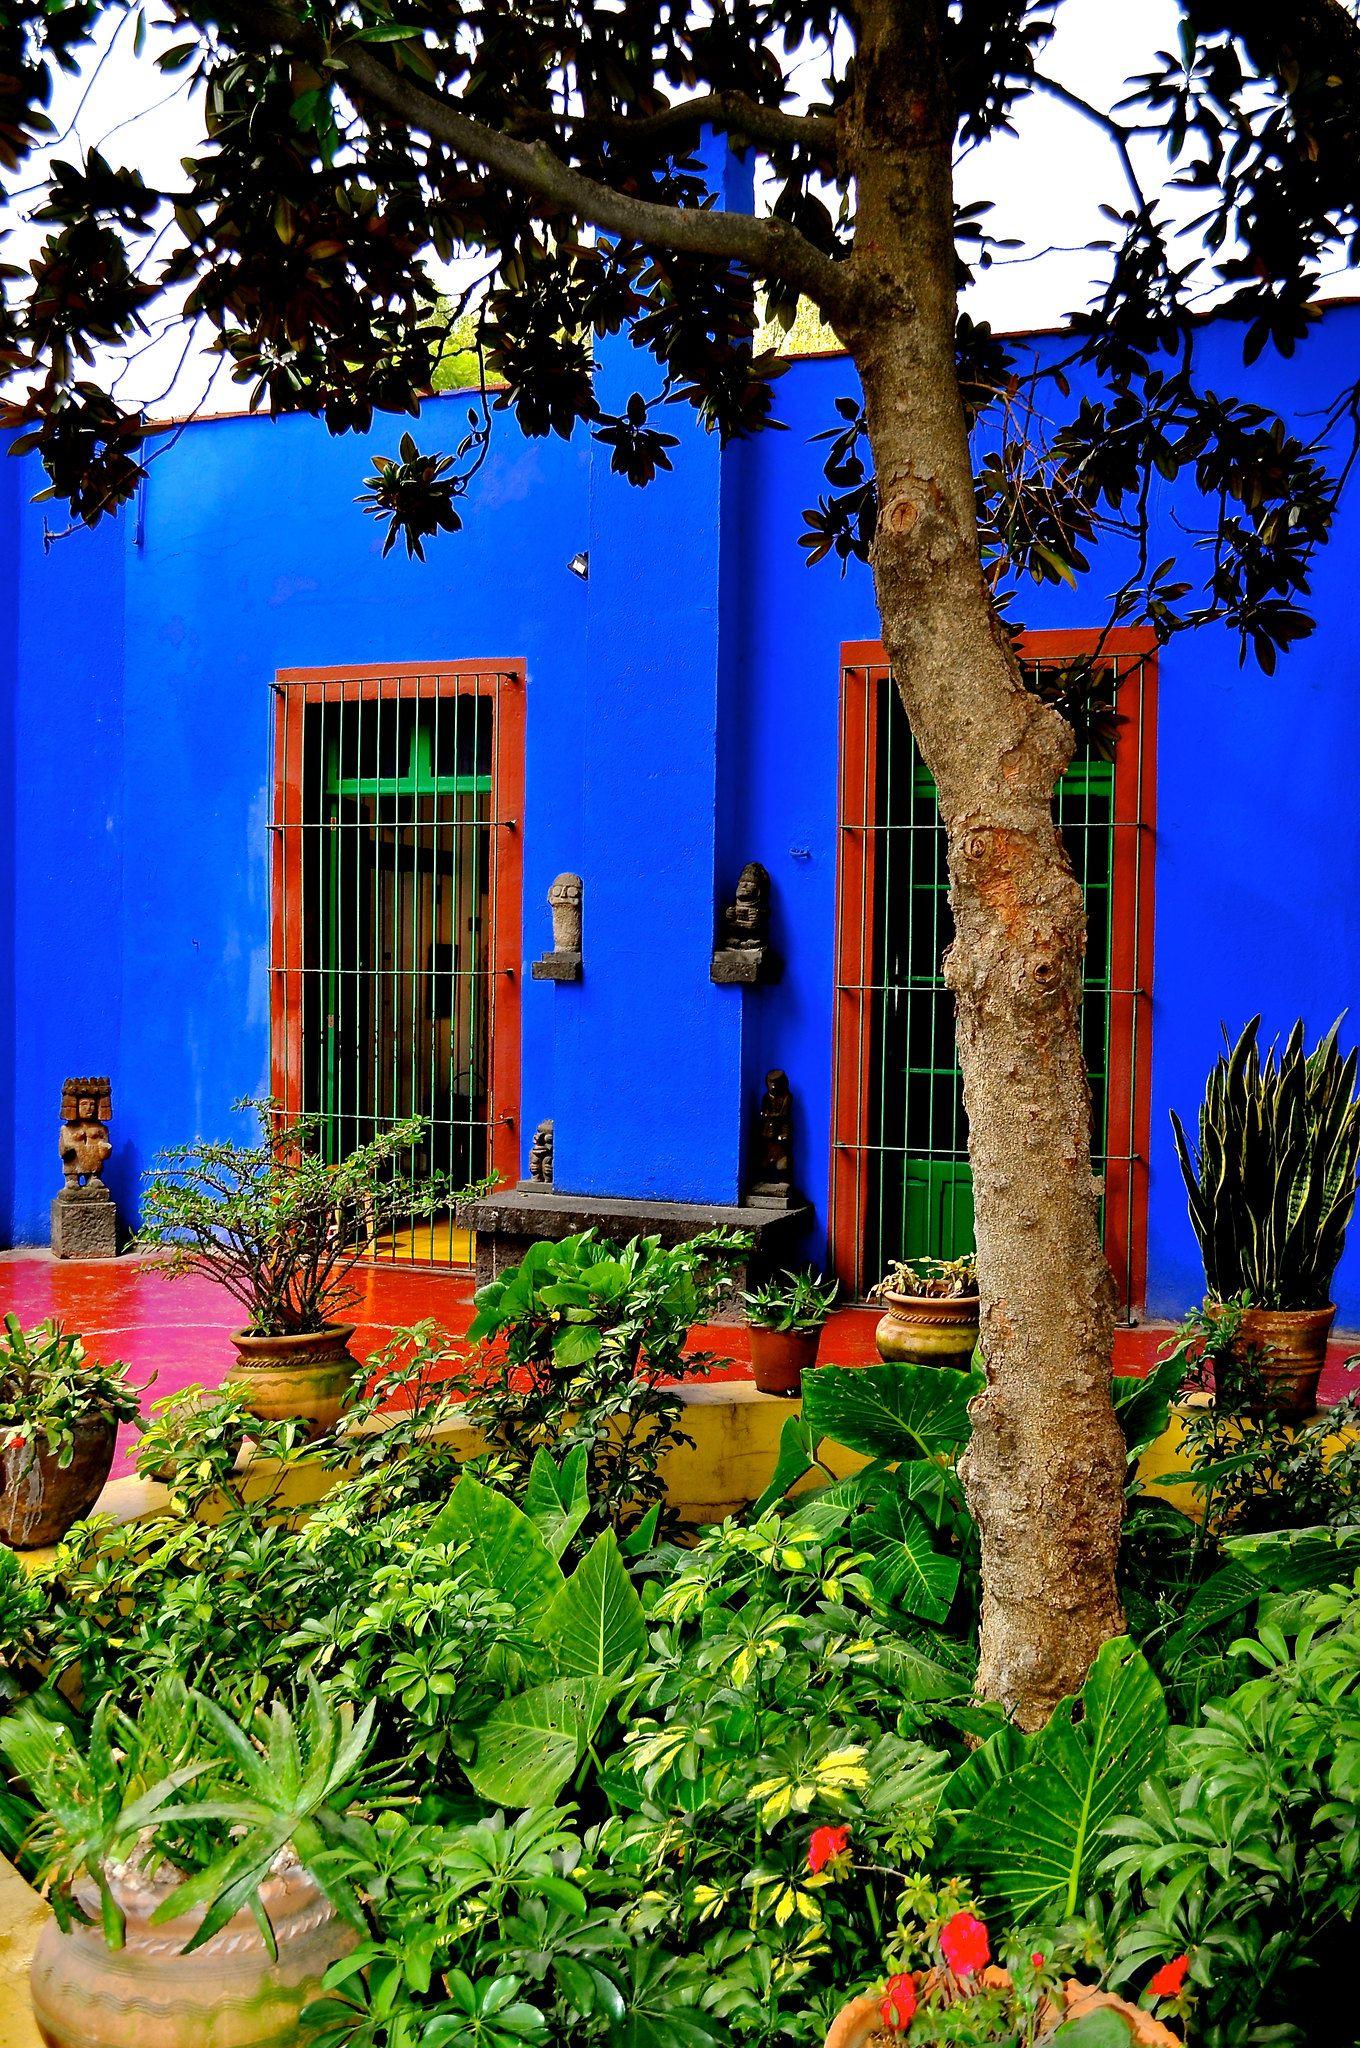 Casa Azul Frida Kahlo Diego Rivera Mexican Garden Frida And Diego Diego Rivera